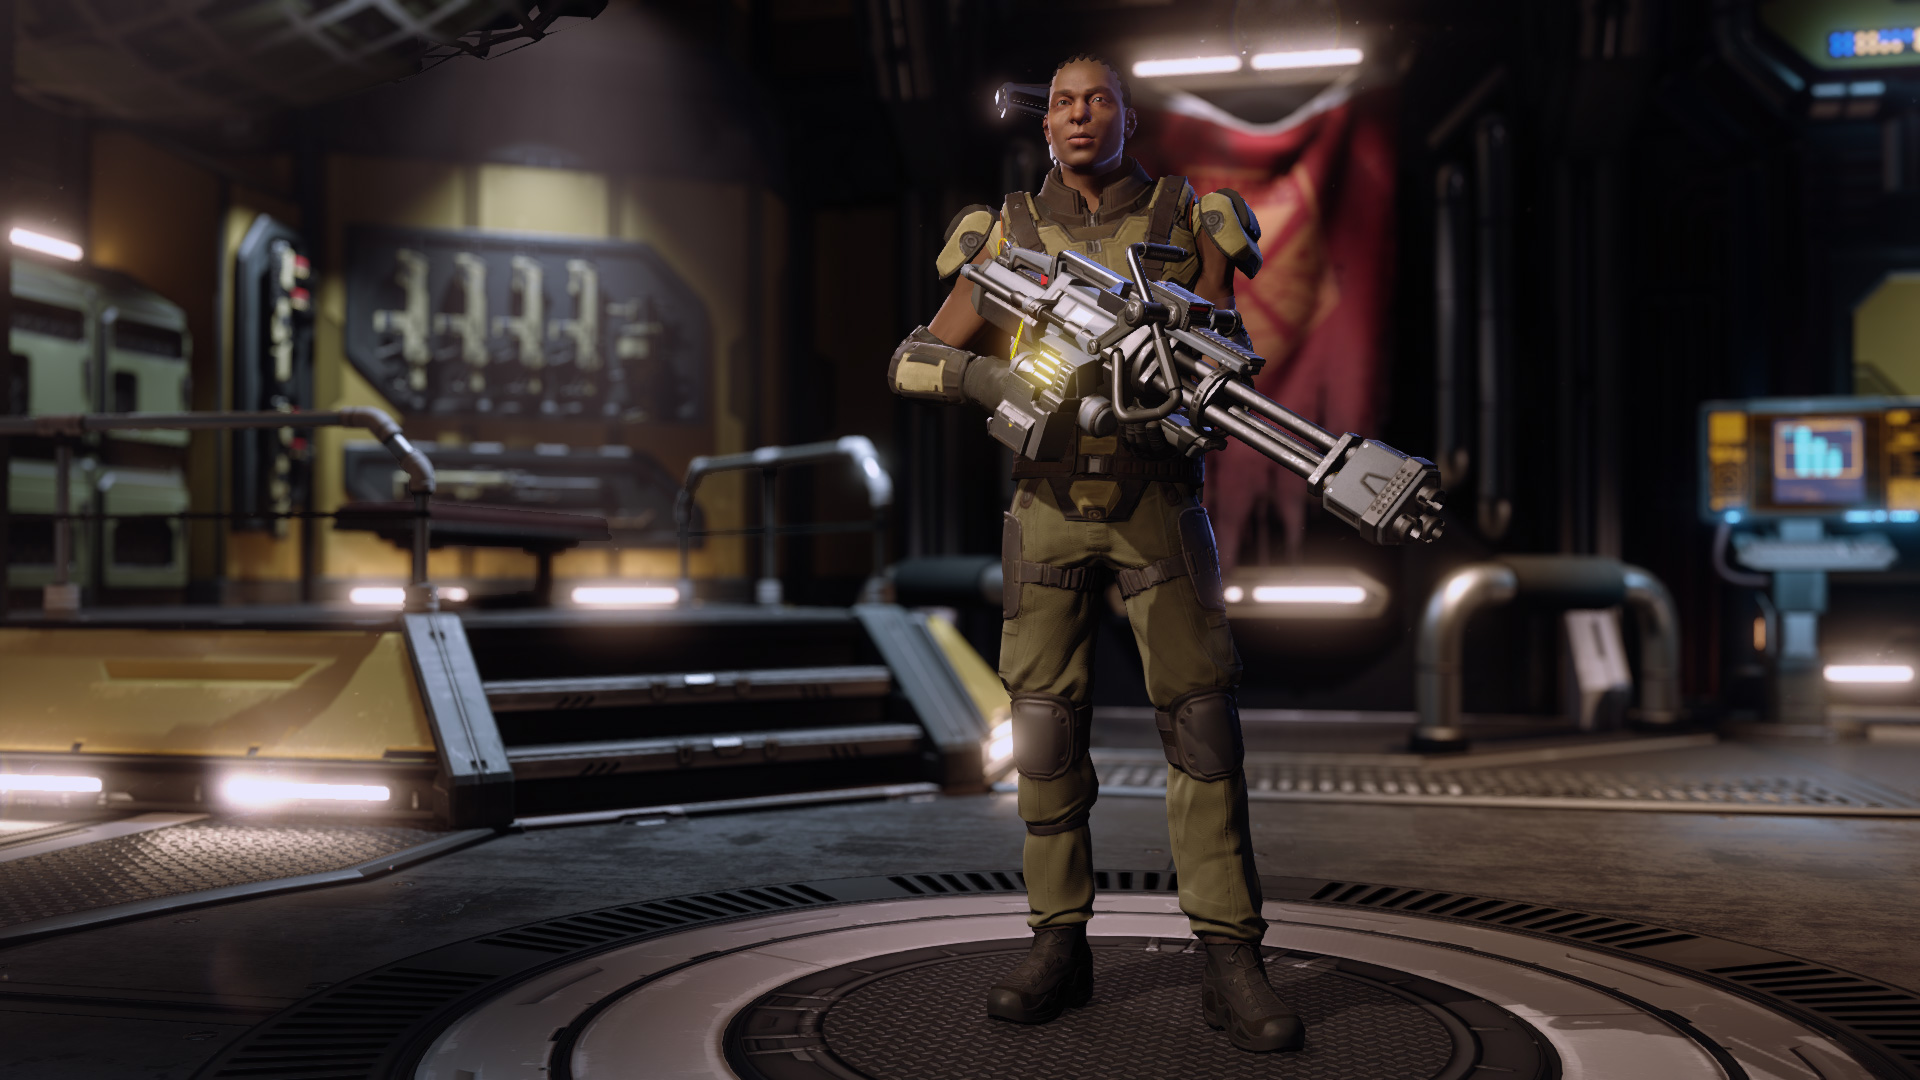 KR - XCOM 2's Grenadier Turns Demolition into an Artfor